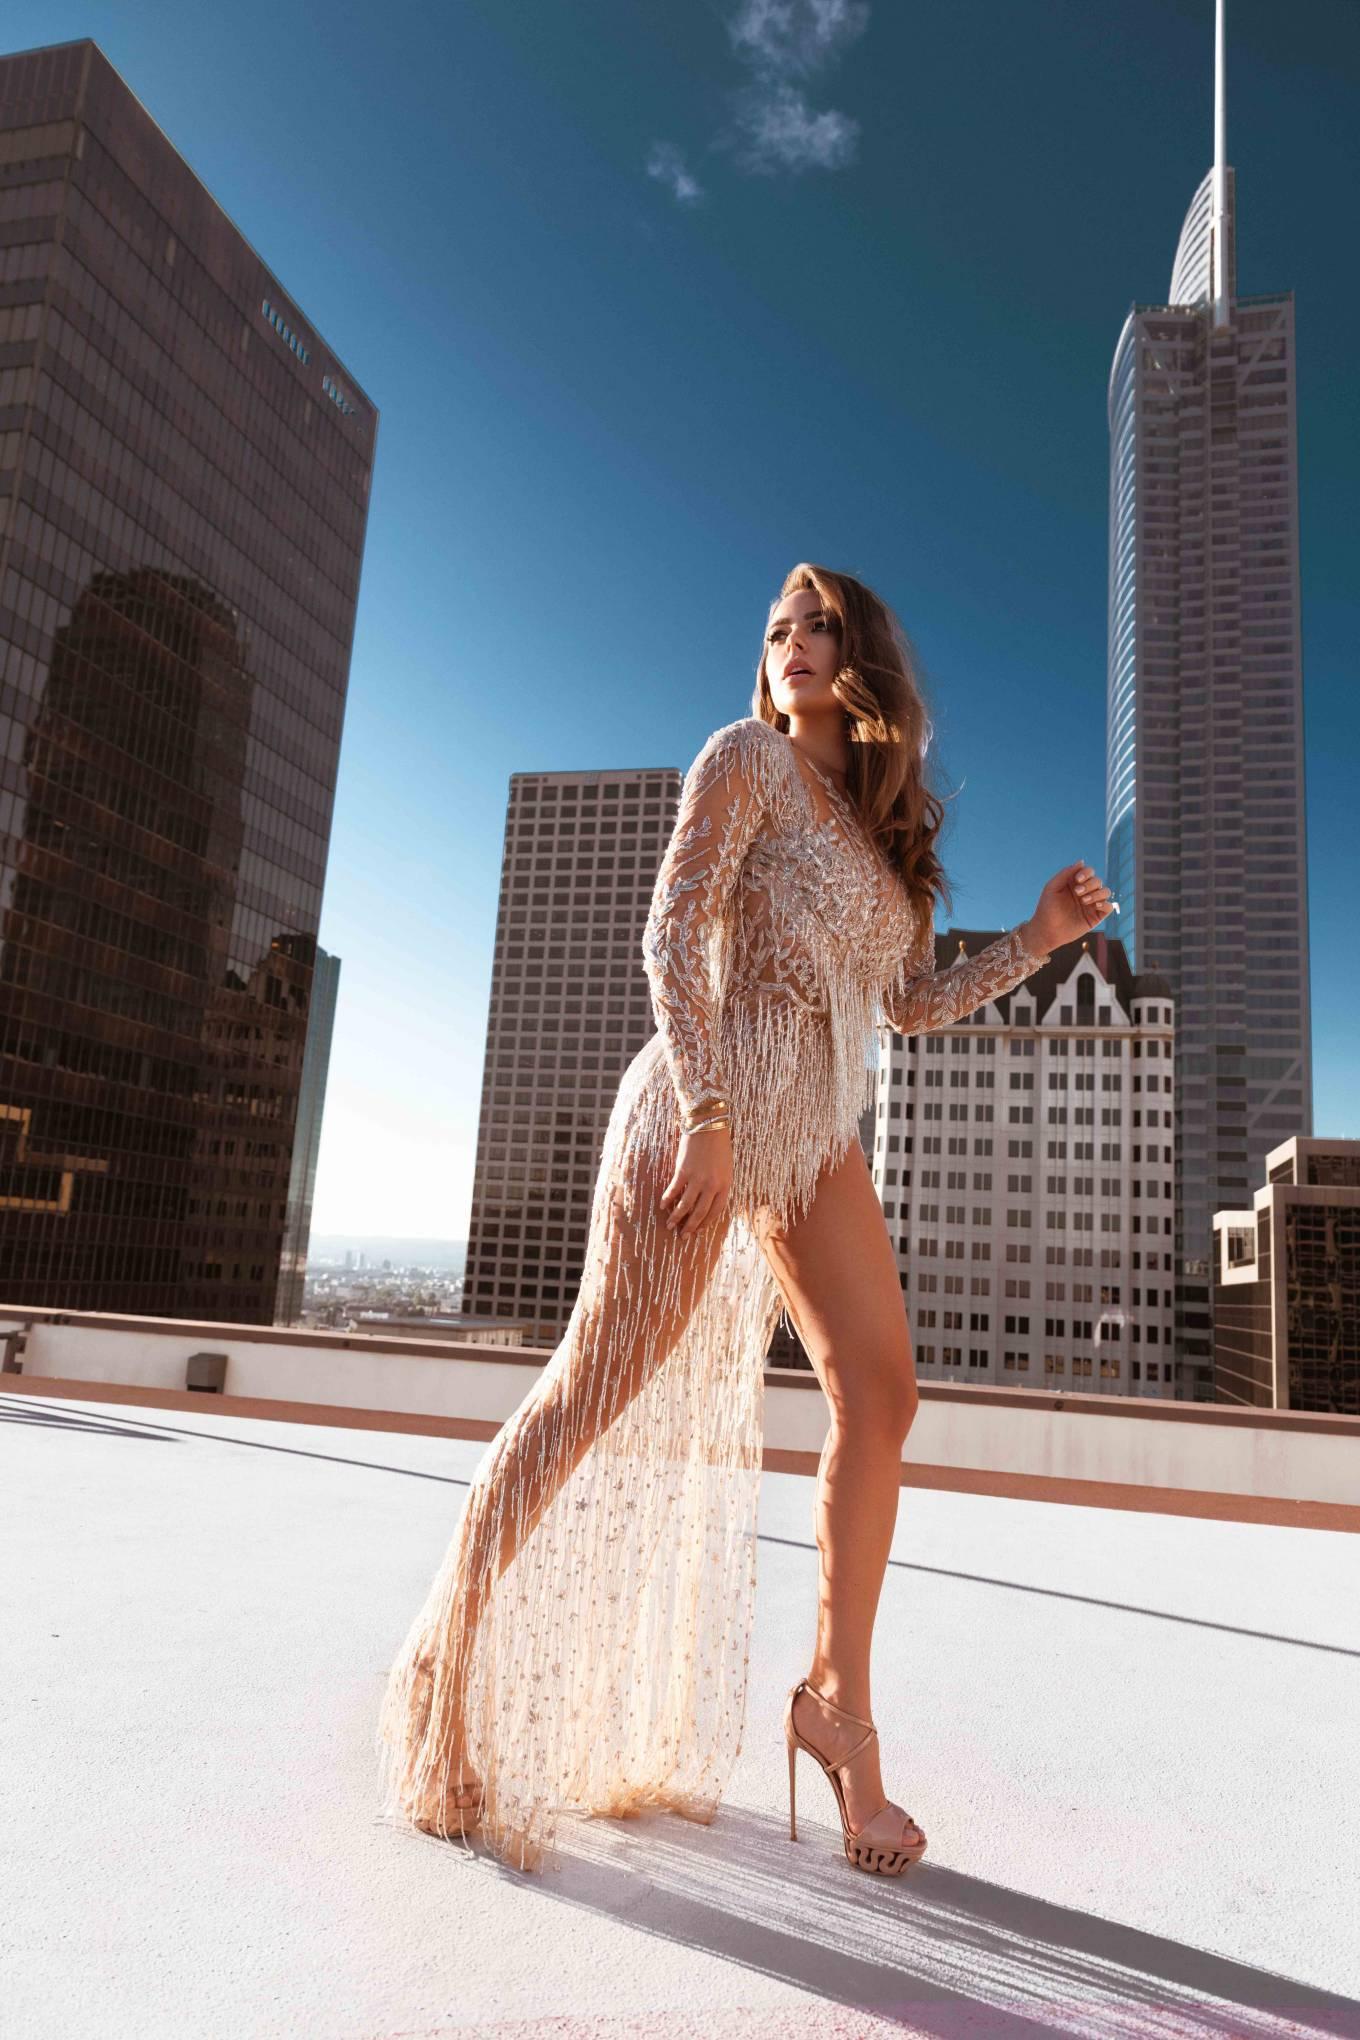 Nadine Mirada - The CiiN magazine (February 2020)